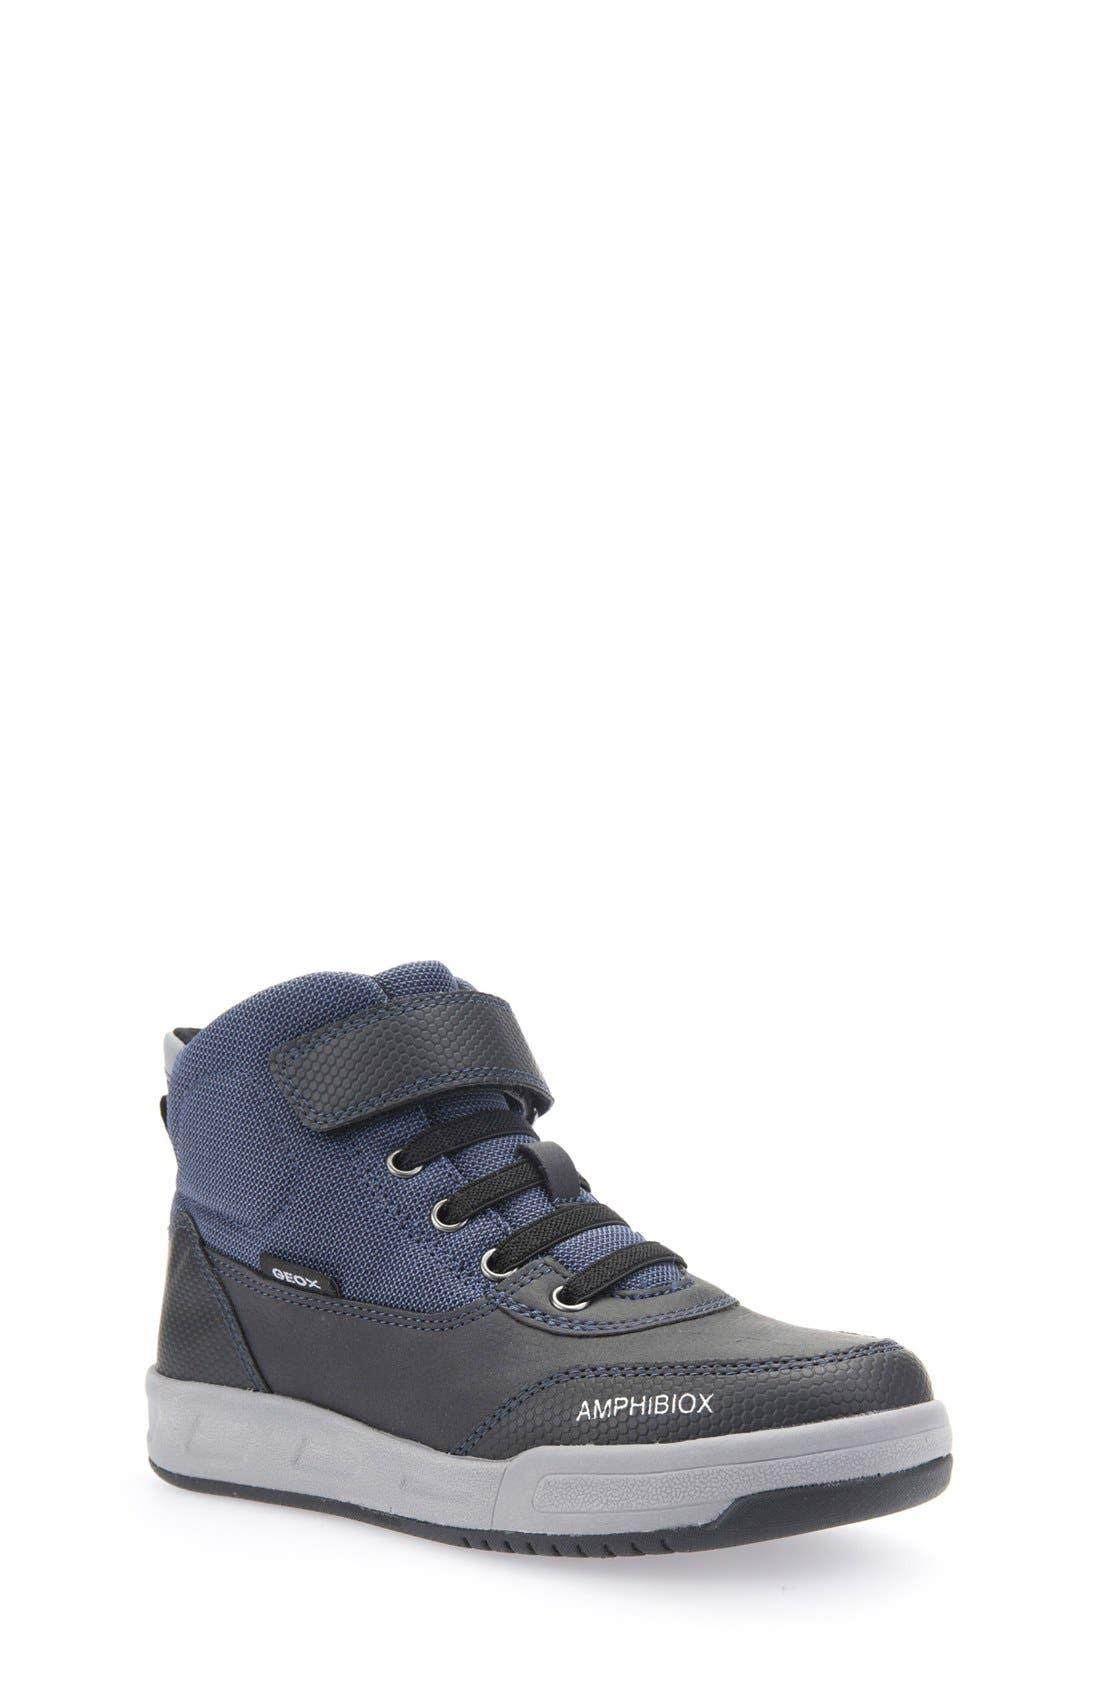 Rolk High Top Sneaker,                         Main,                         color, Navy/ Black